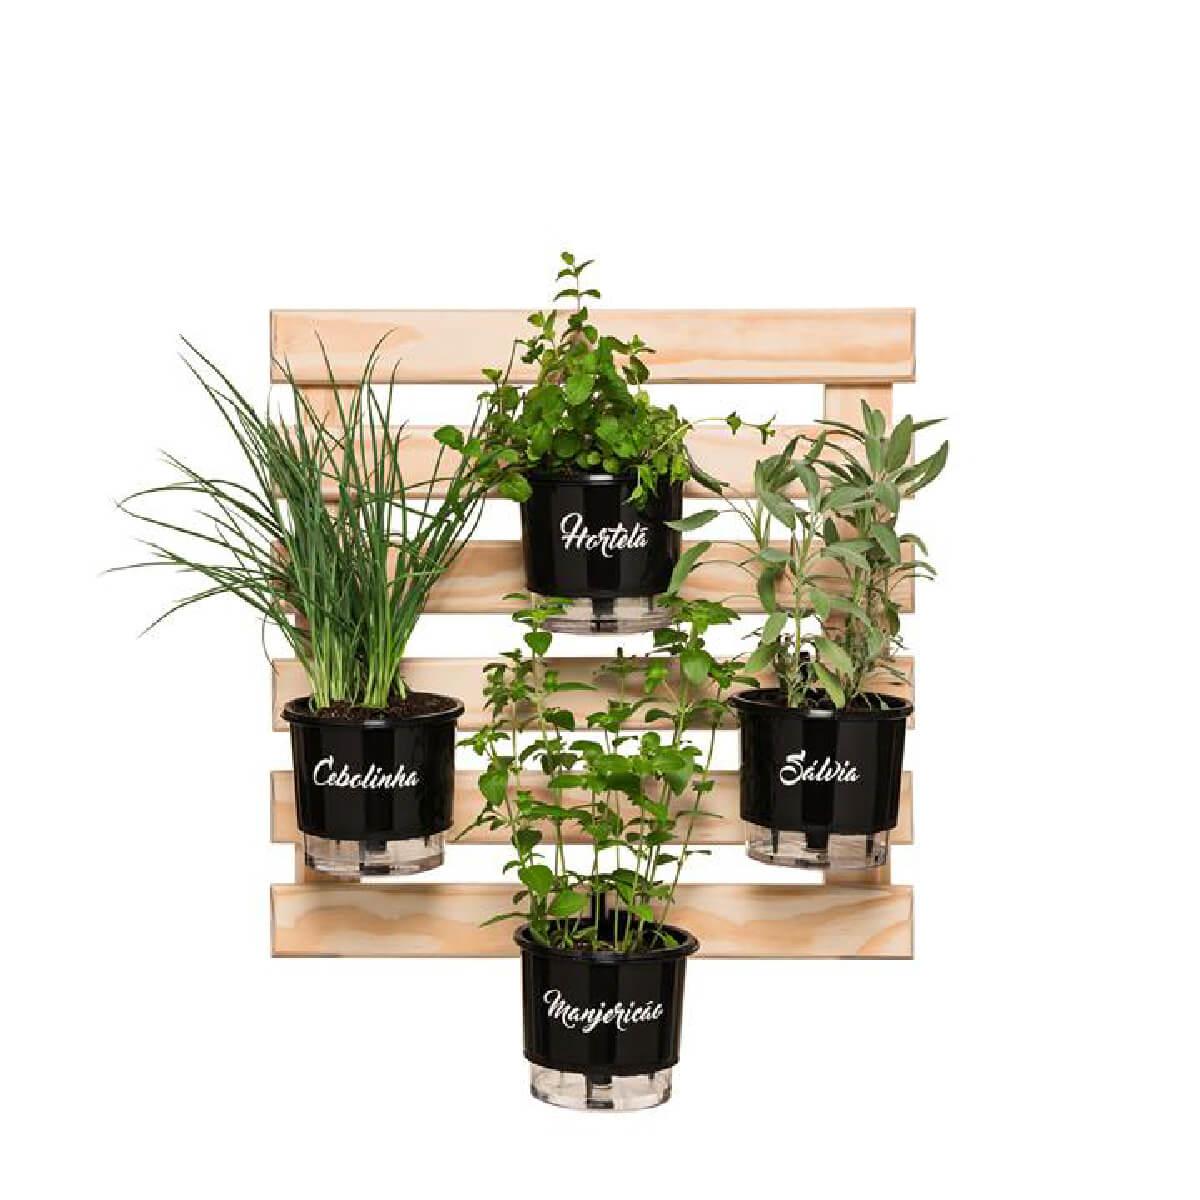 Kit Horta Vertical 60cm x 60cm com 4 Vasos Gourmet  - Vasos Raiz Loja Oficial